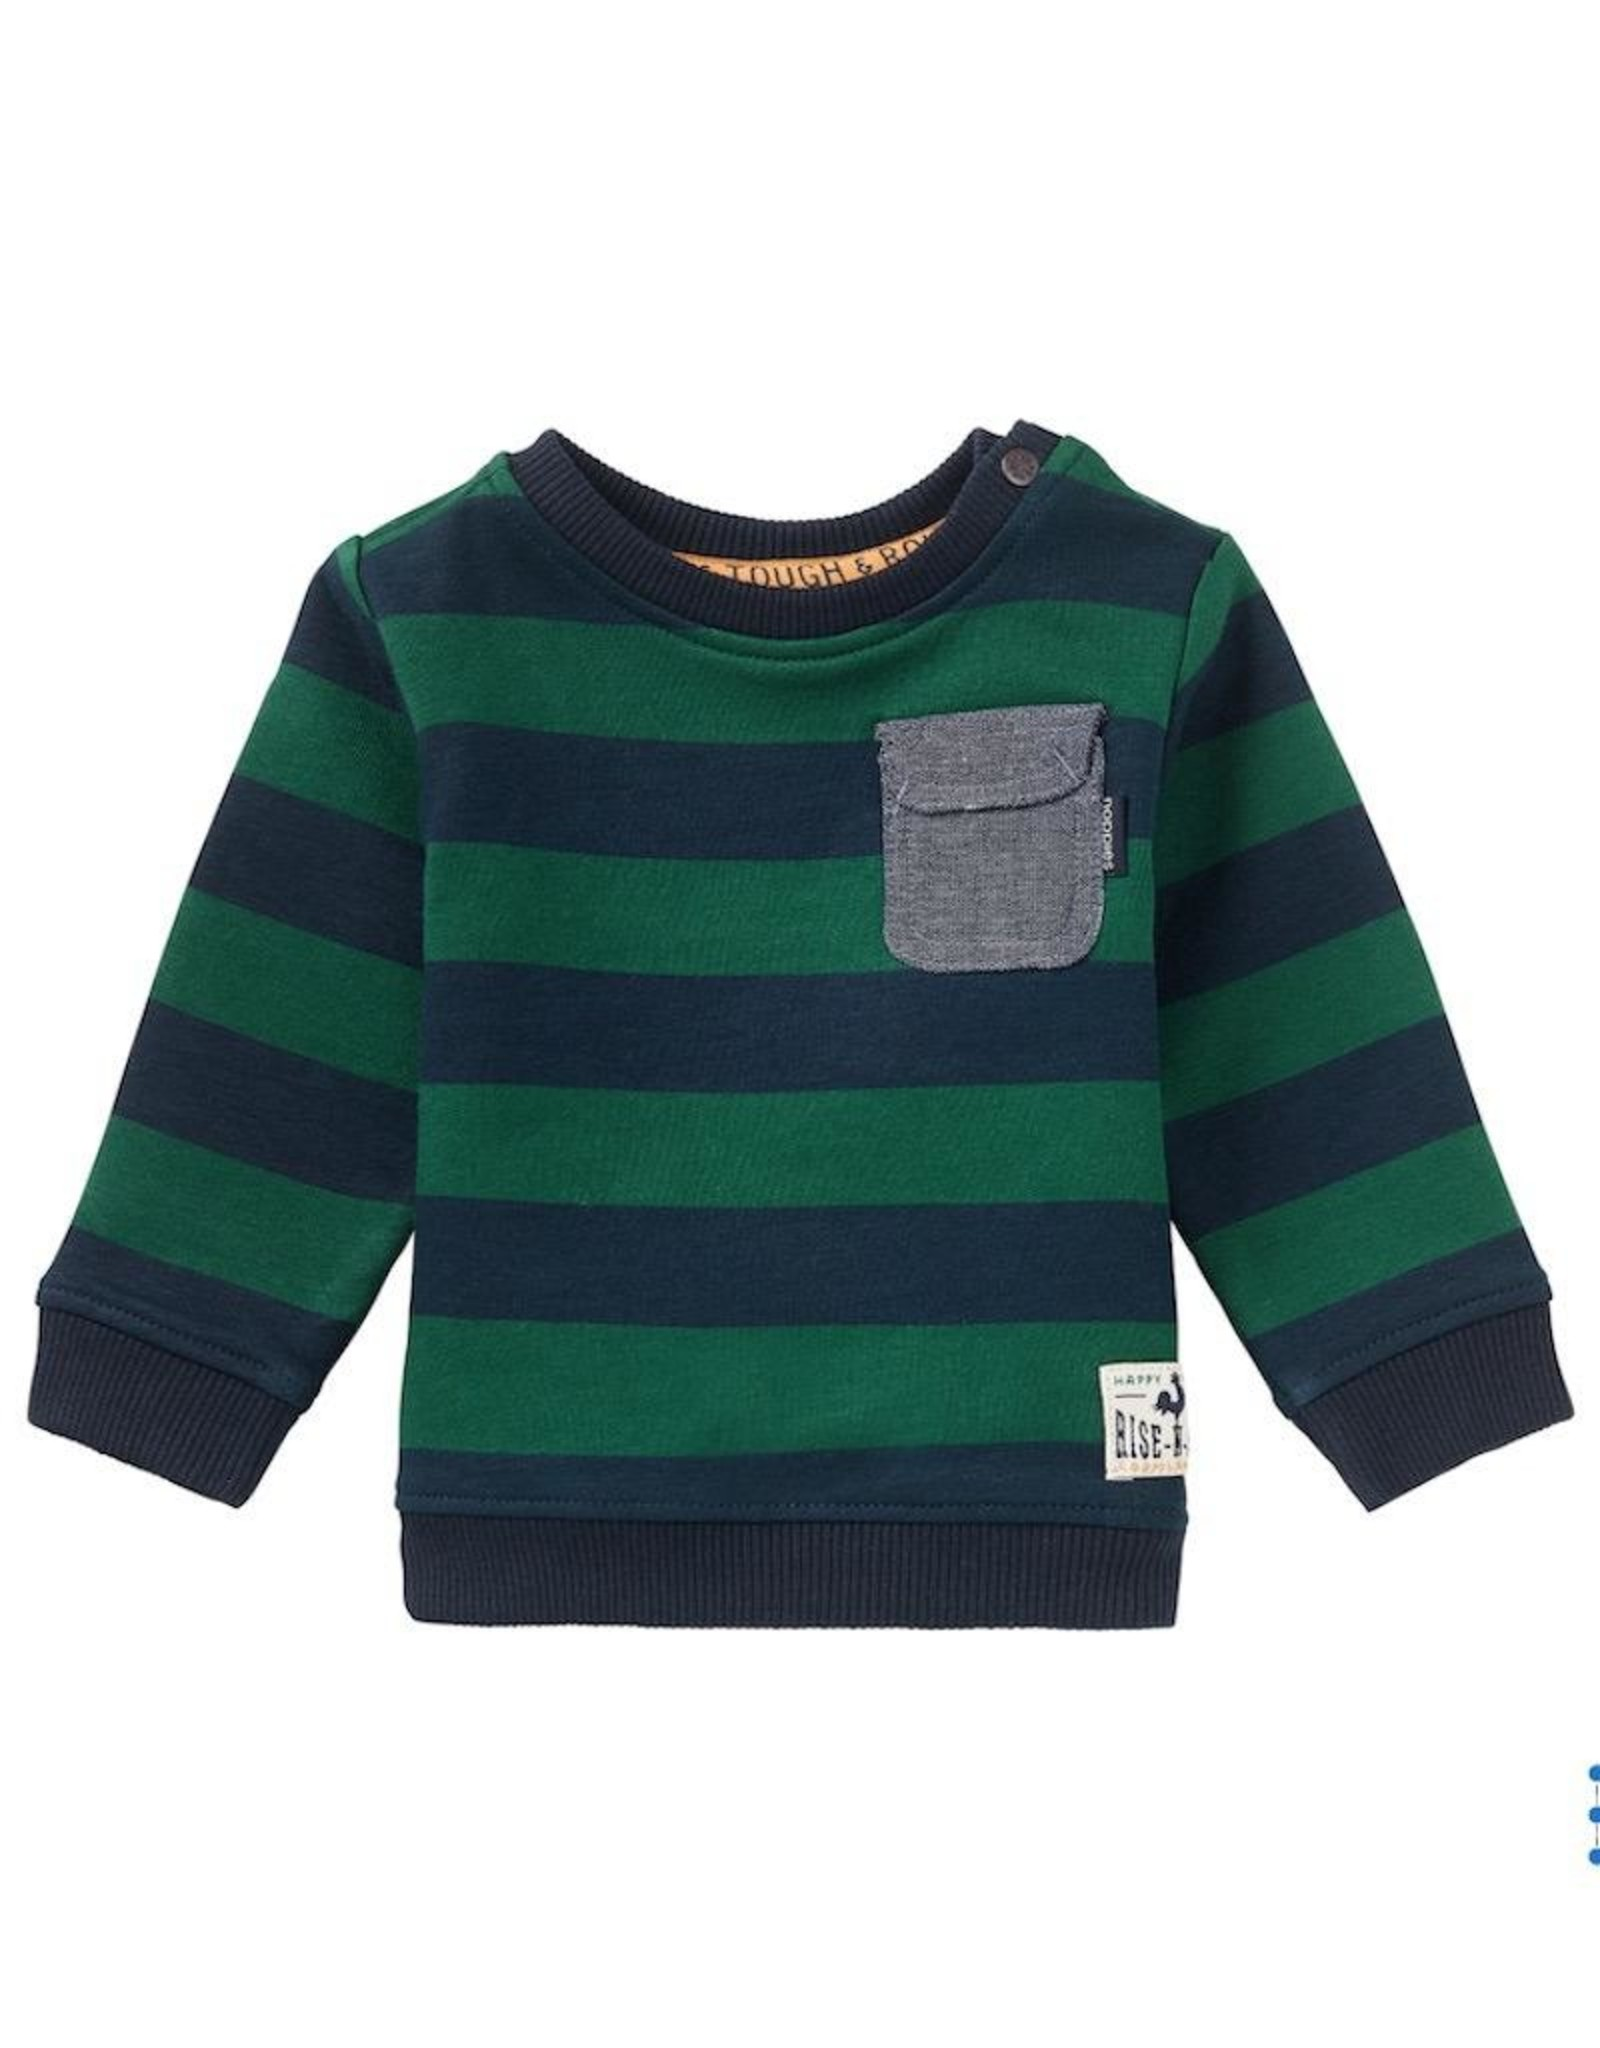 Noppies Kids Oviston Baby Boy's Long Sleeve Sweater in Dark Sapphire